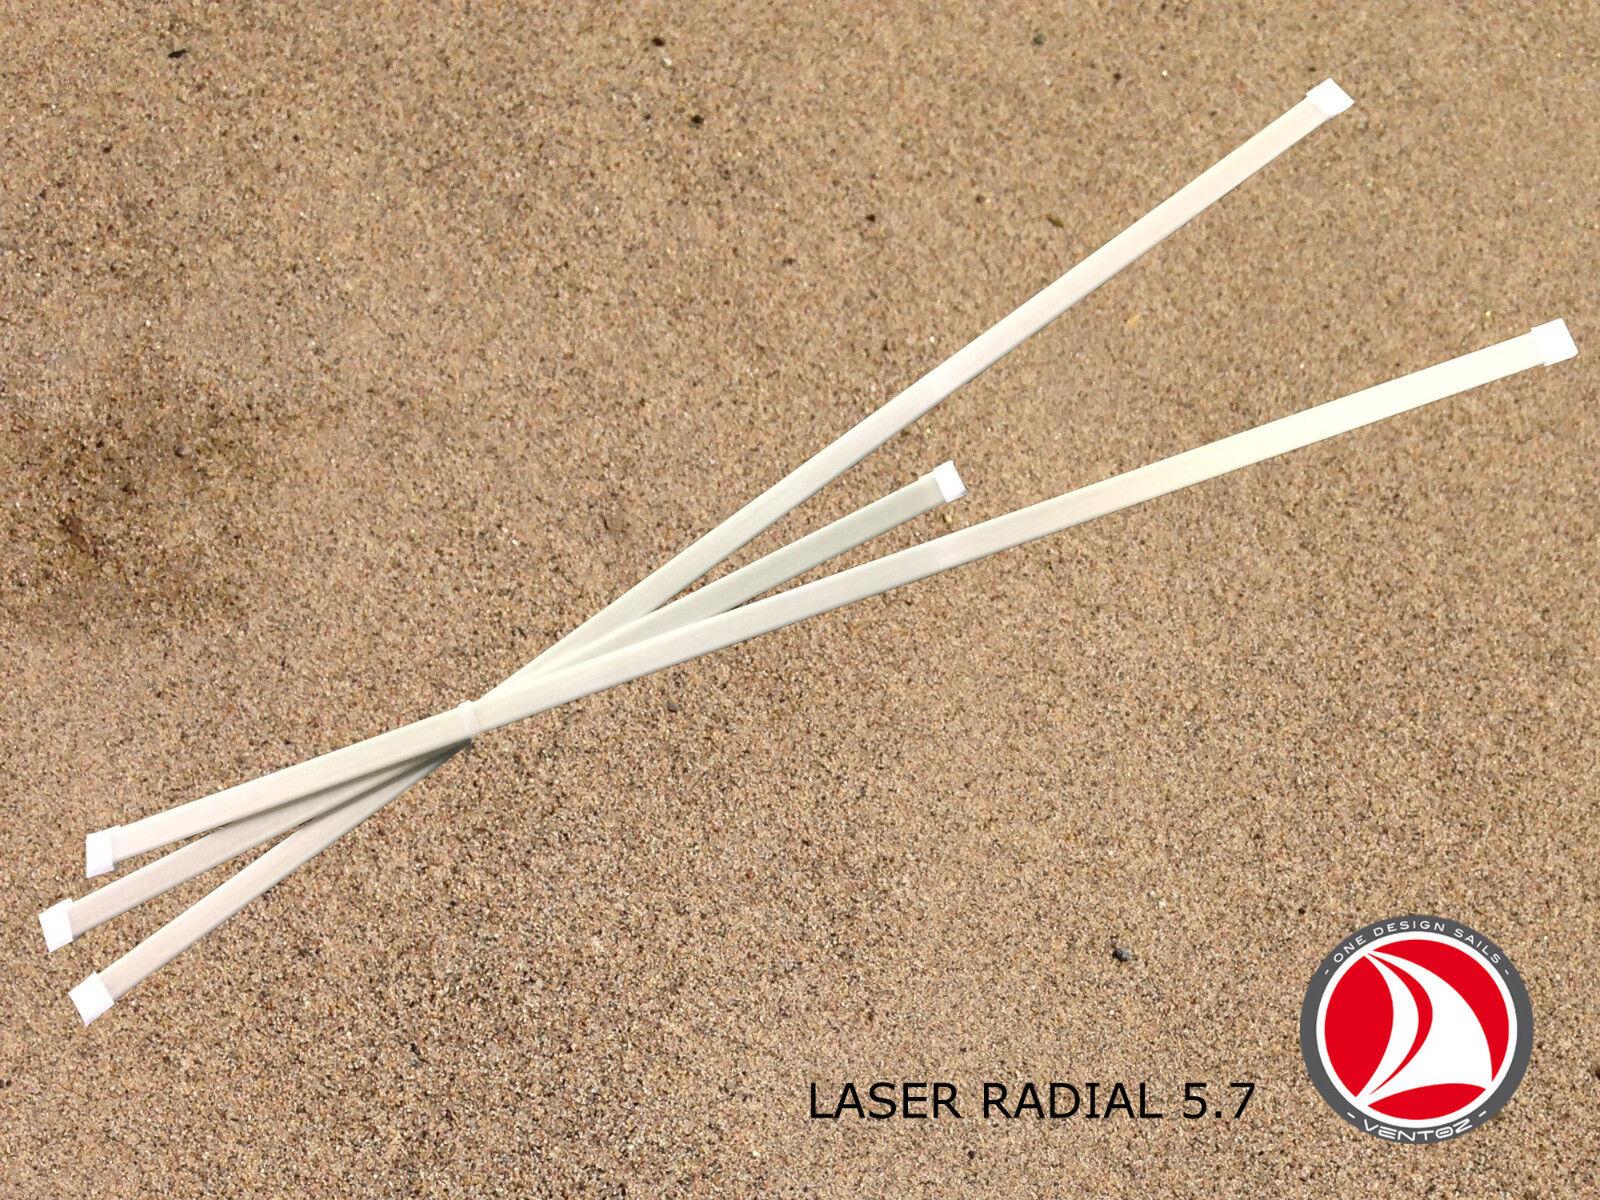 Ventoz Laser Laser Laser Radial Segel (5,7 m2) - Weiß 4b0e34